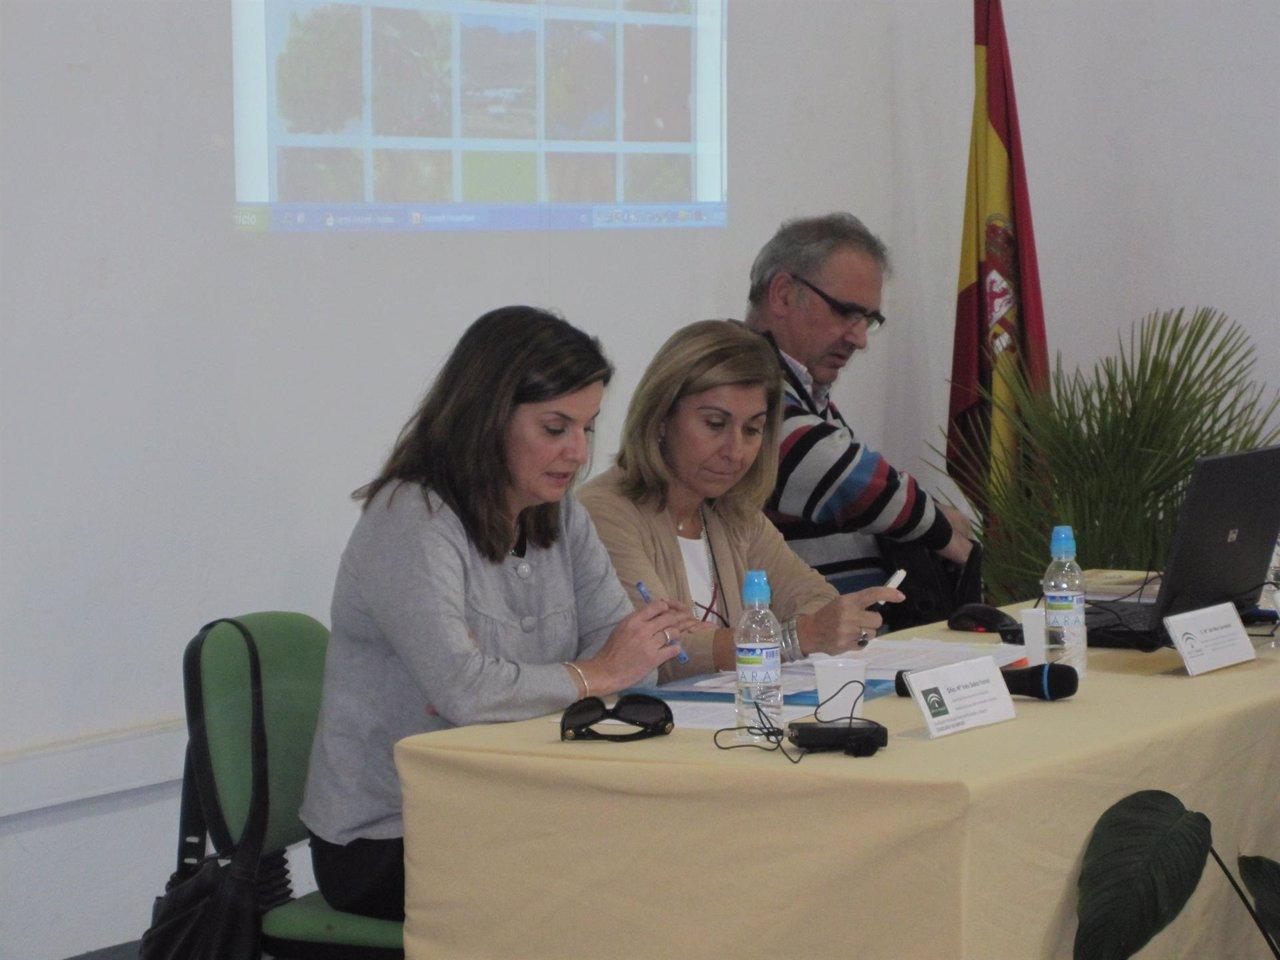 Jornada de formación colectiva en Rodalquilar sobre agricultura ecológica